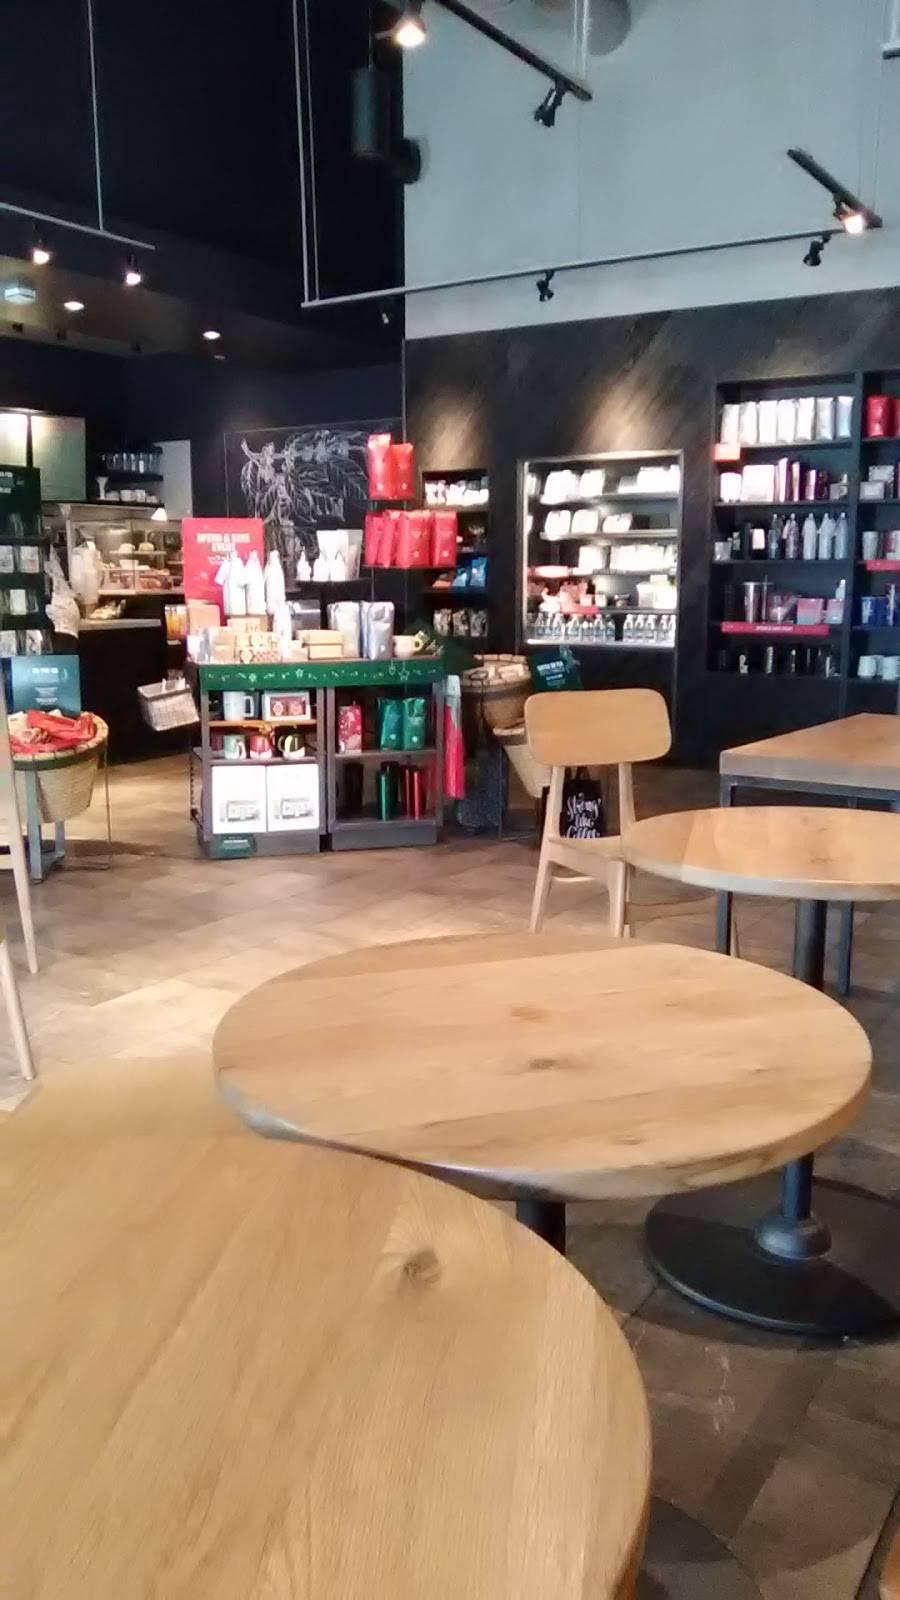 Starbucks   cafe   1687 N California St #1, Stockton, CA 95204, USA   2094708596 OR +1 209-470-8596